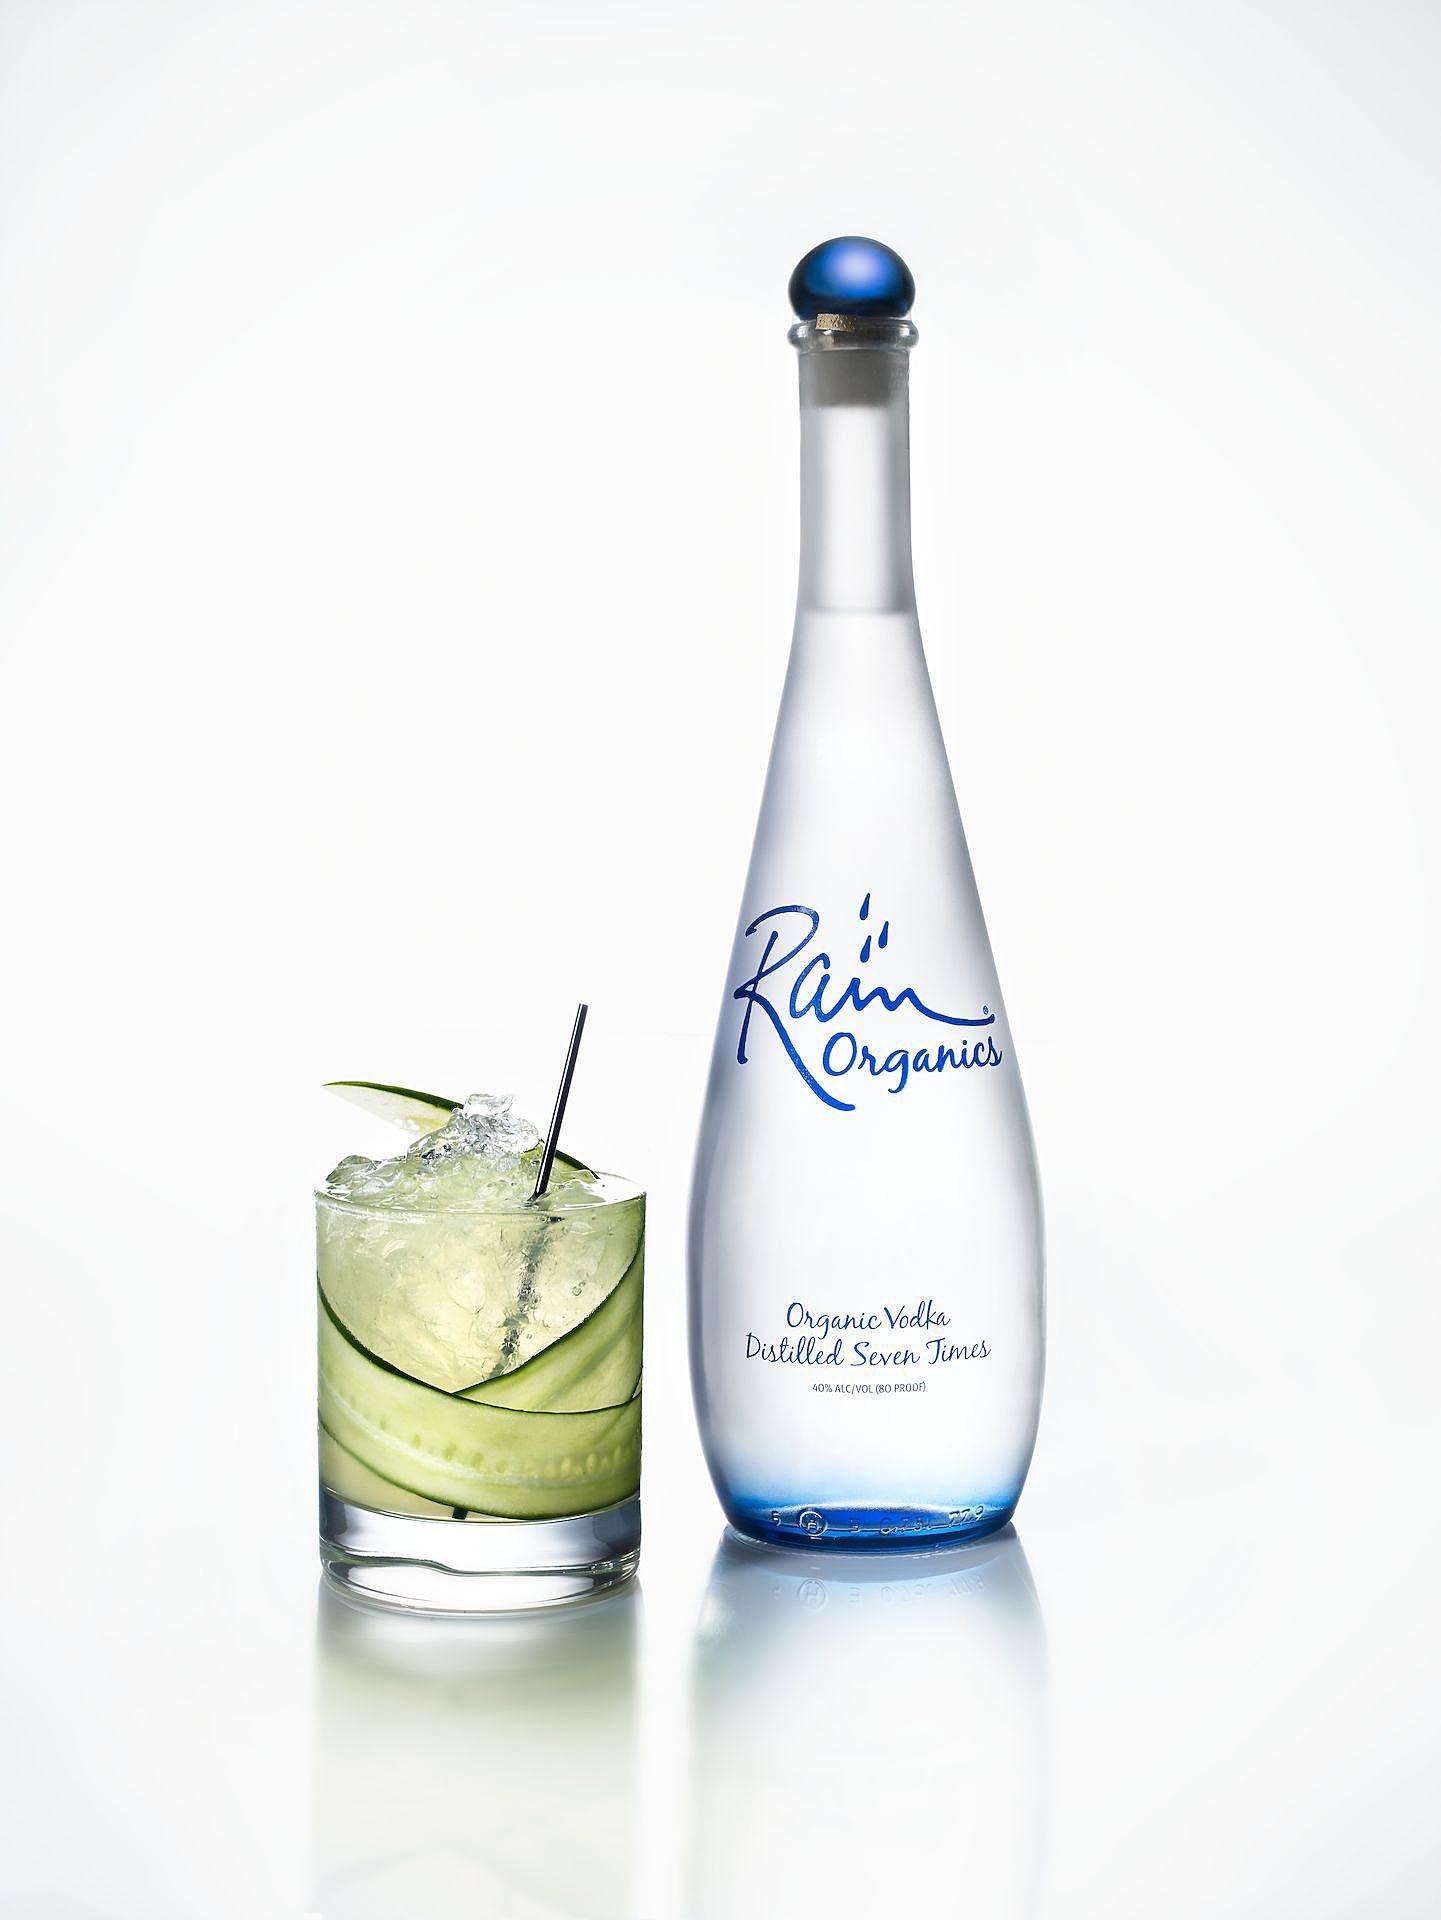 orgianic vodka.jpg